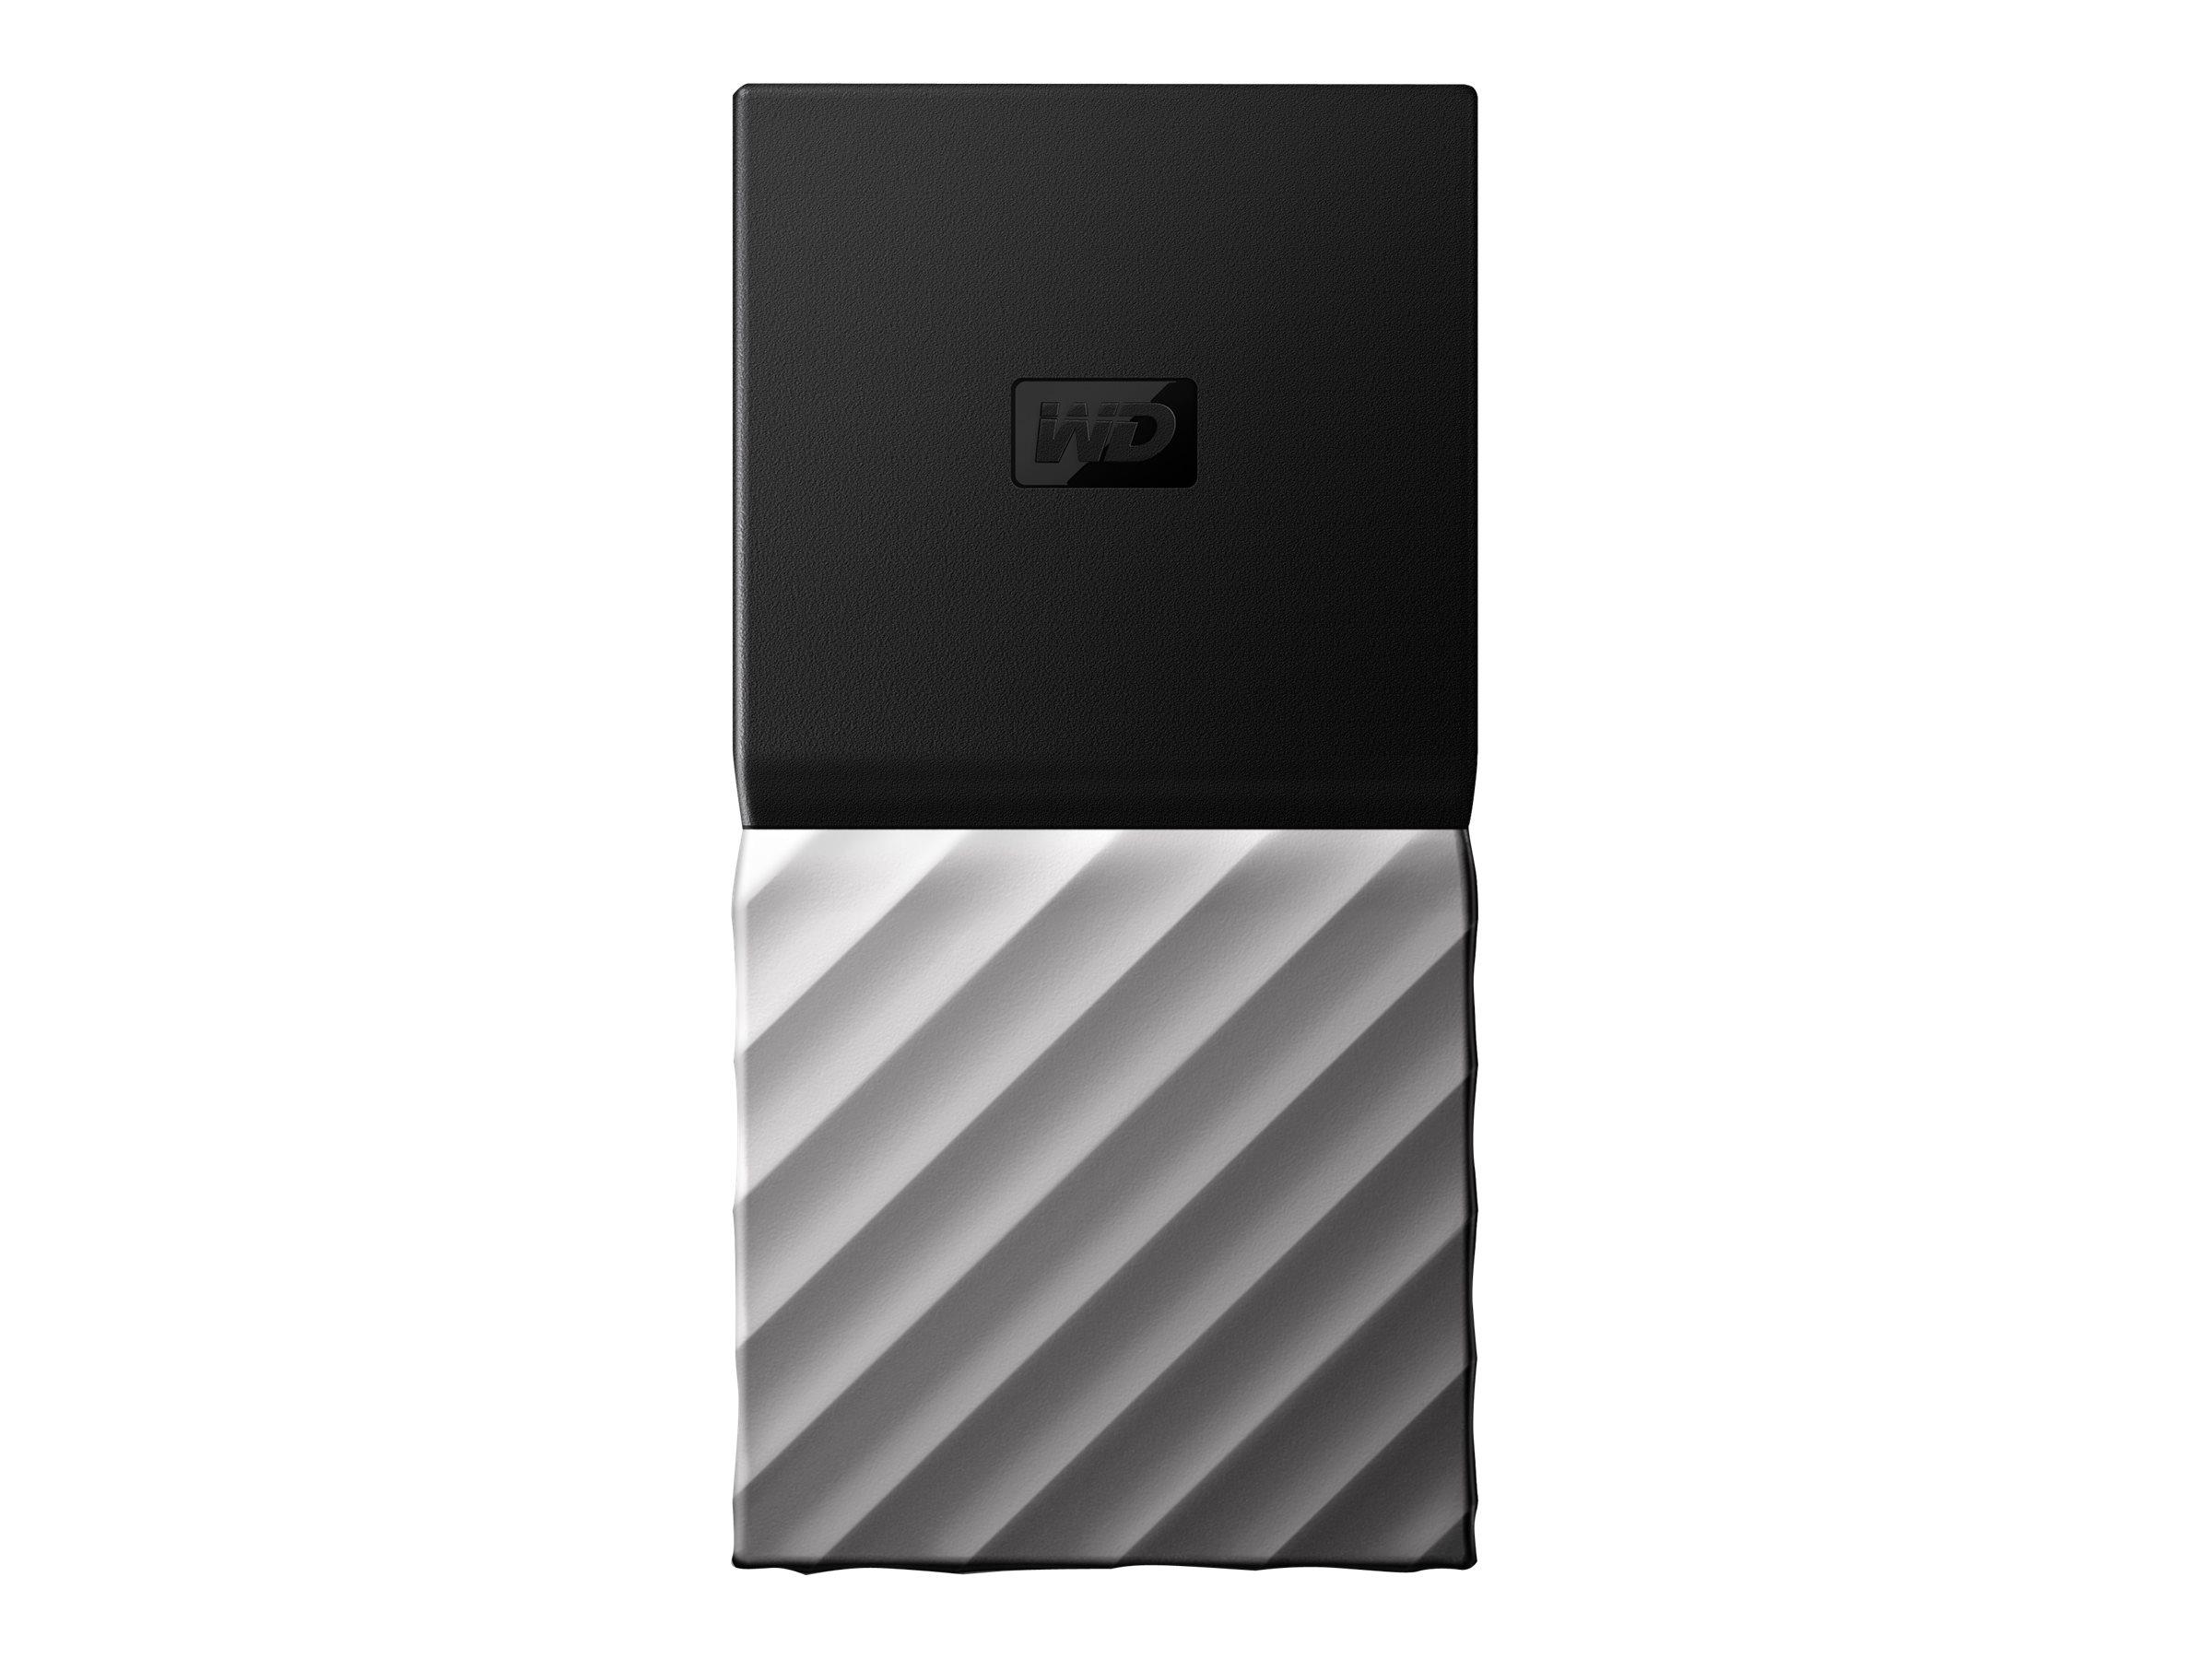 WD My Passport SSD WDBKVX0020PSL - Solid-State-Disk - verschlüsselt - 2 TB - extern (tragbar) - USB 3.1 Gen 2 (USB-C Steckverbin